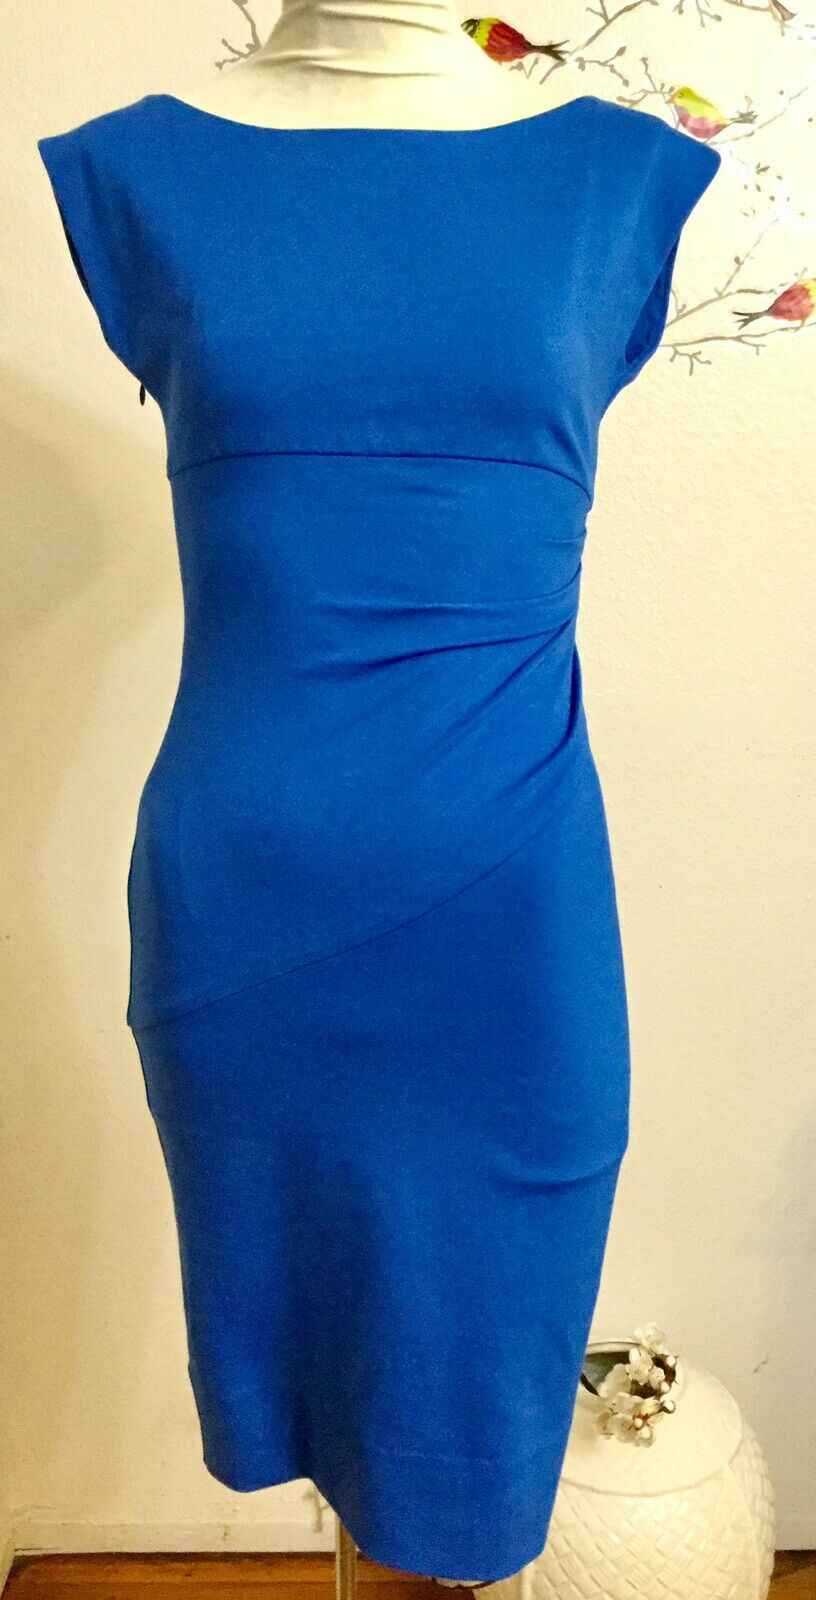 Diane Von Furstenberg Woherren Royal Blau Sheath Fitted Sheath Dress Sz. 2